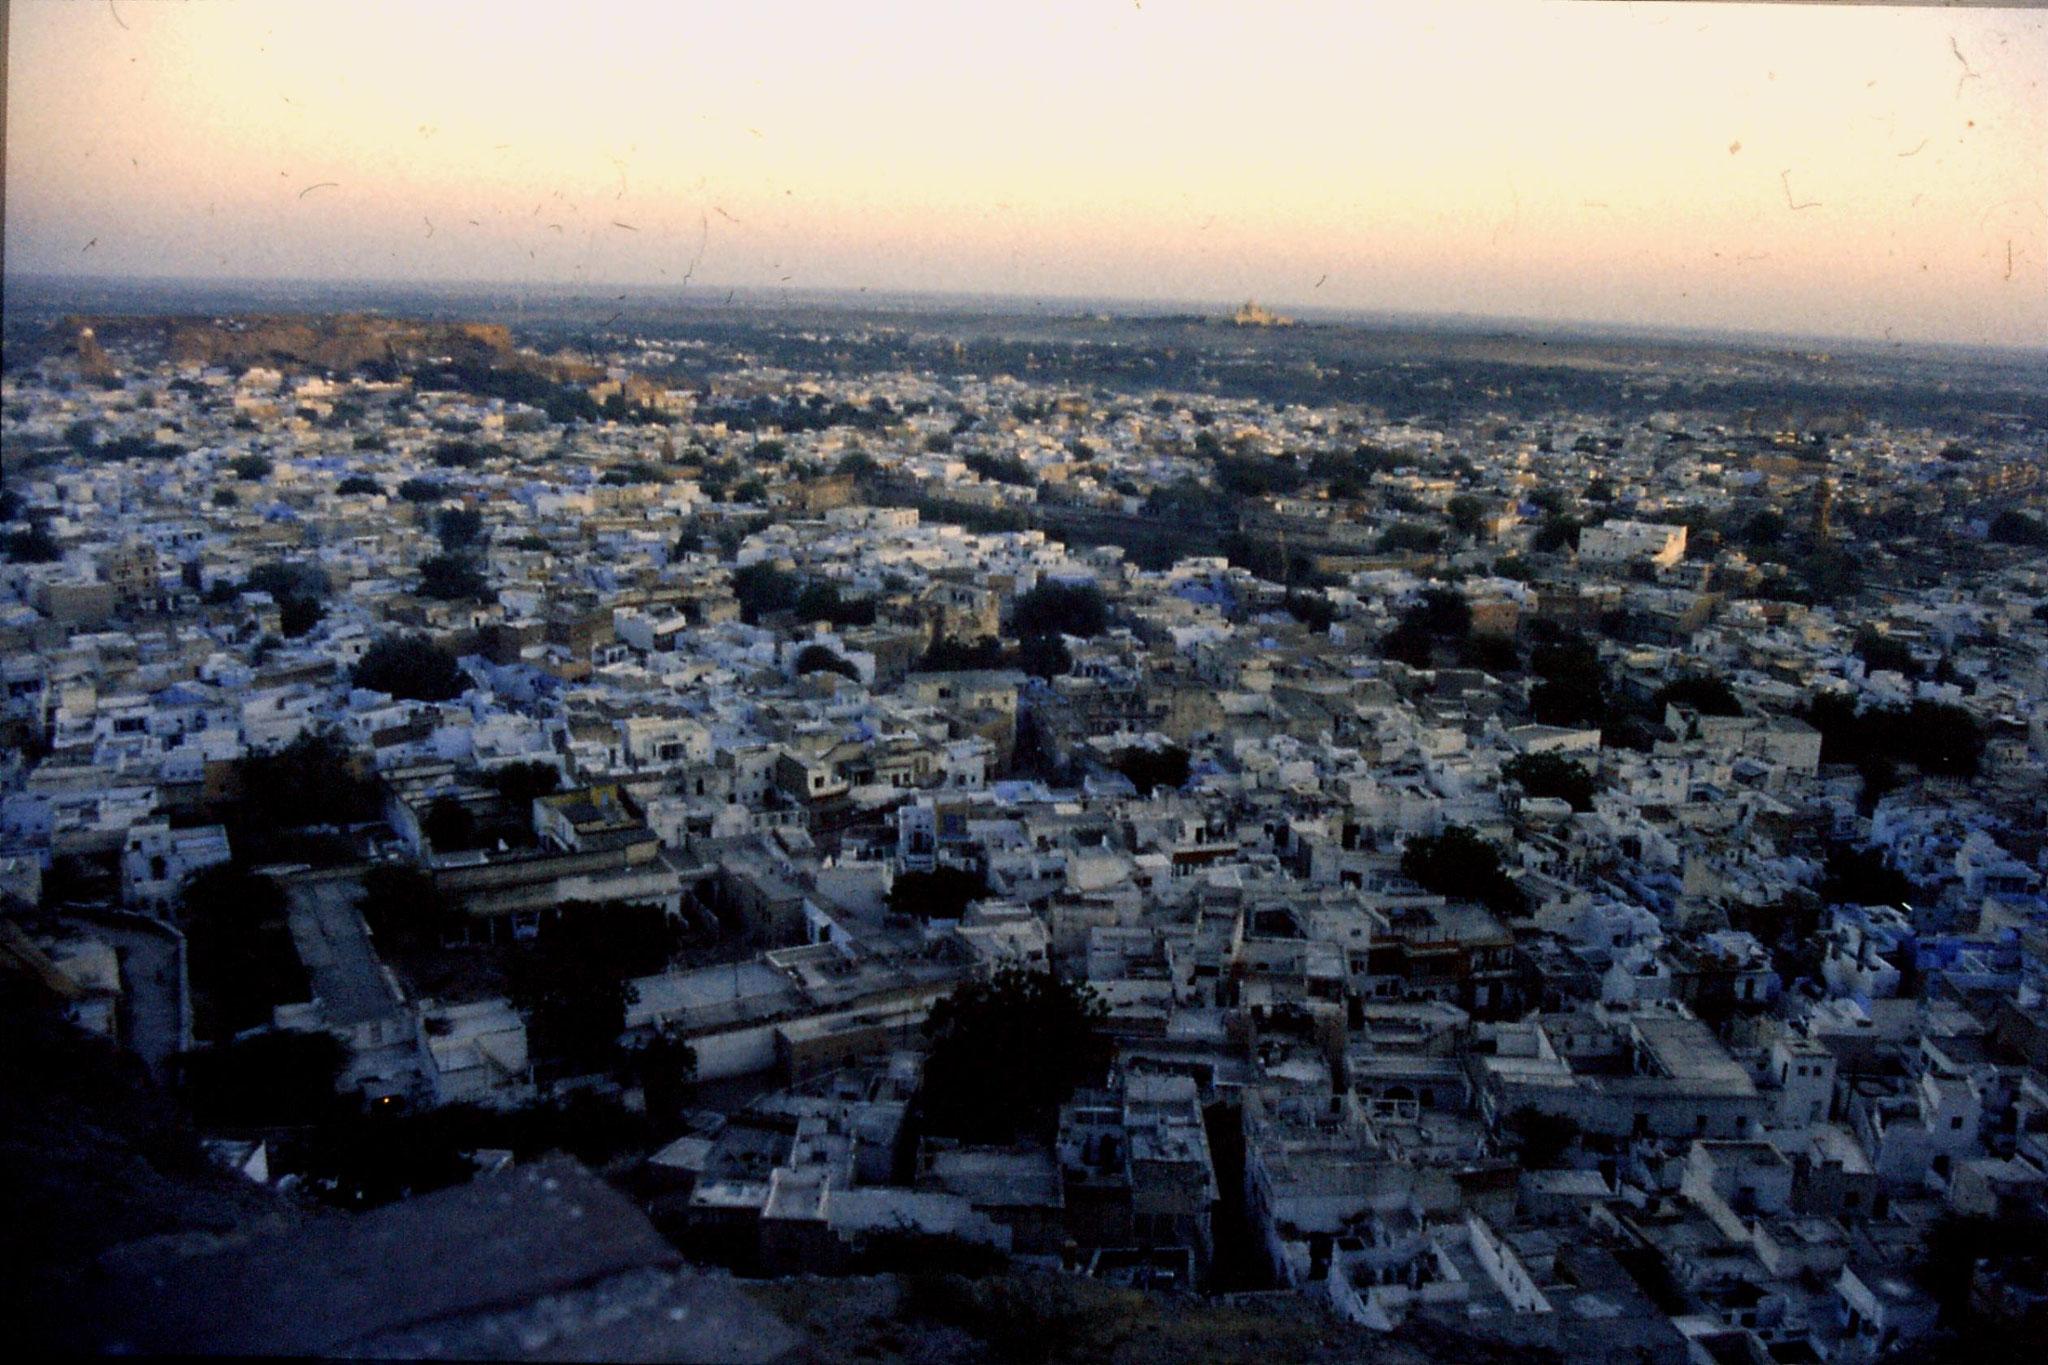 28/11/1989: 2: Jodhpur looking SE